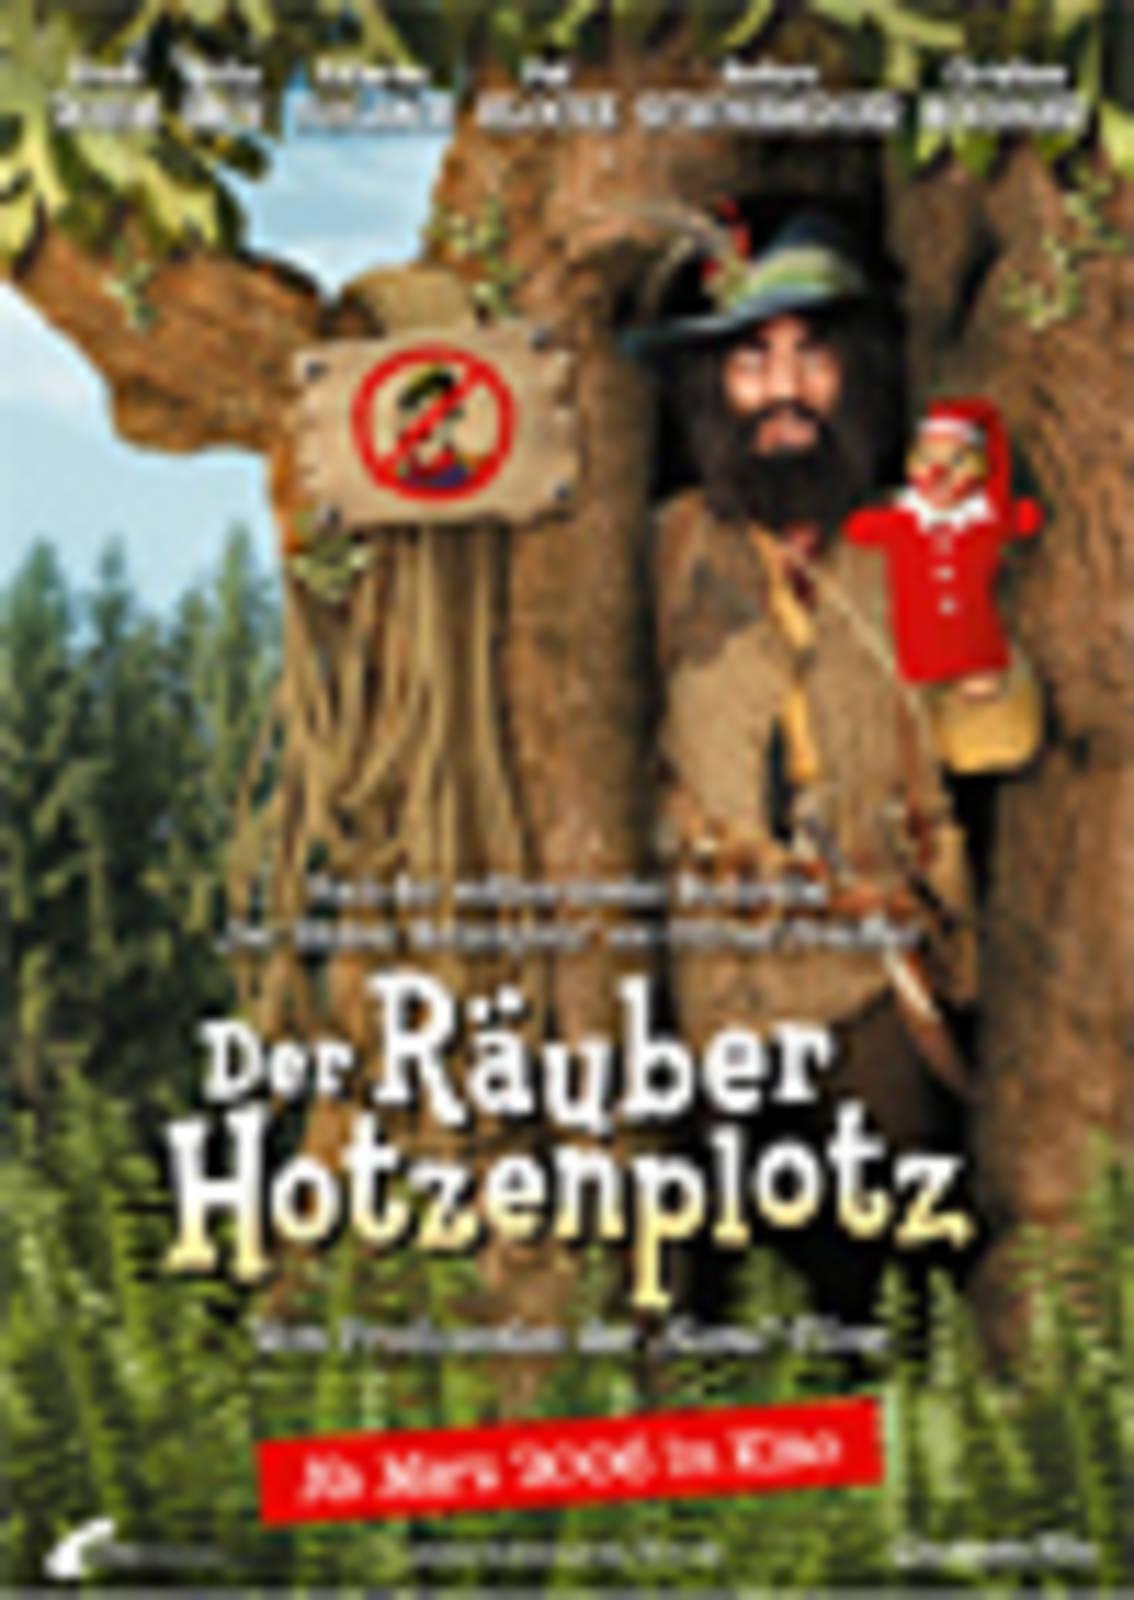 Räuber Hotzenplotz Film